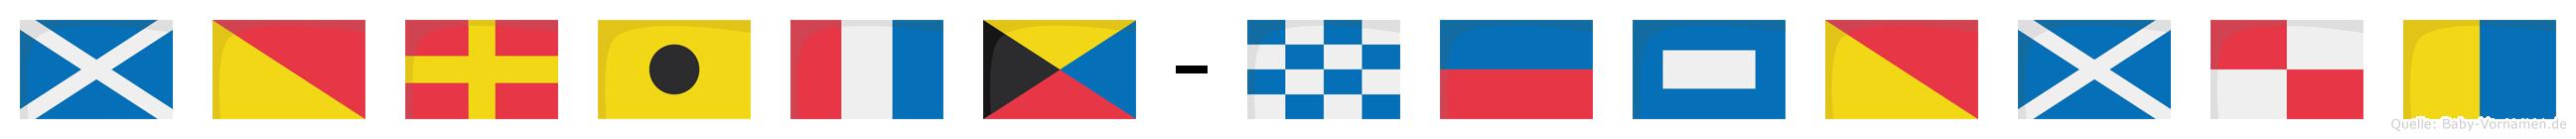 Moritz-Nepomuk im Flaggenalphabet